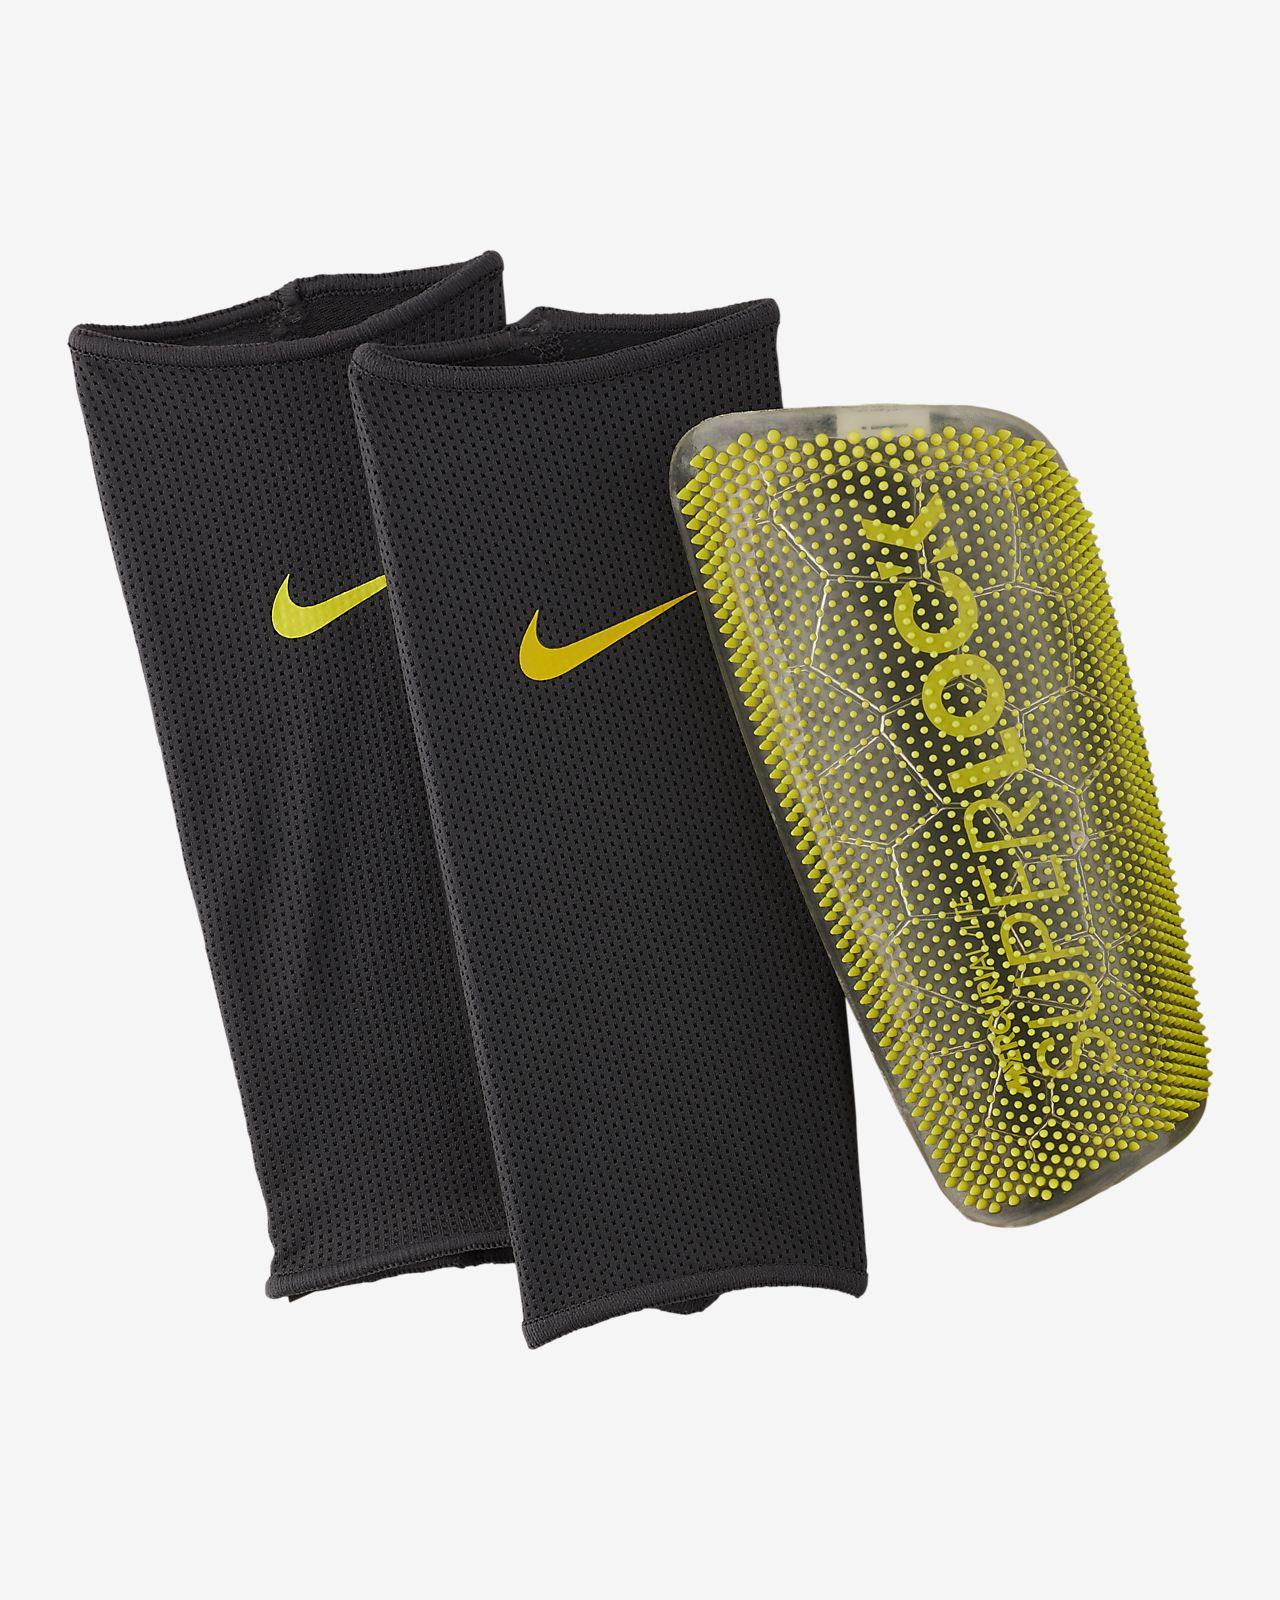 1b61a07b975 Nike Mercurial Lite SuperLock Football Shinguards. Nike.com IN